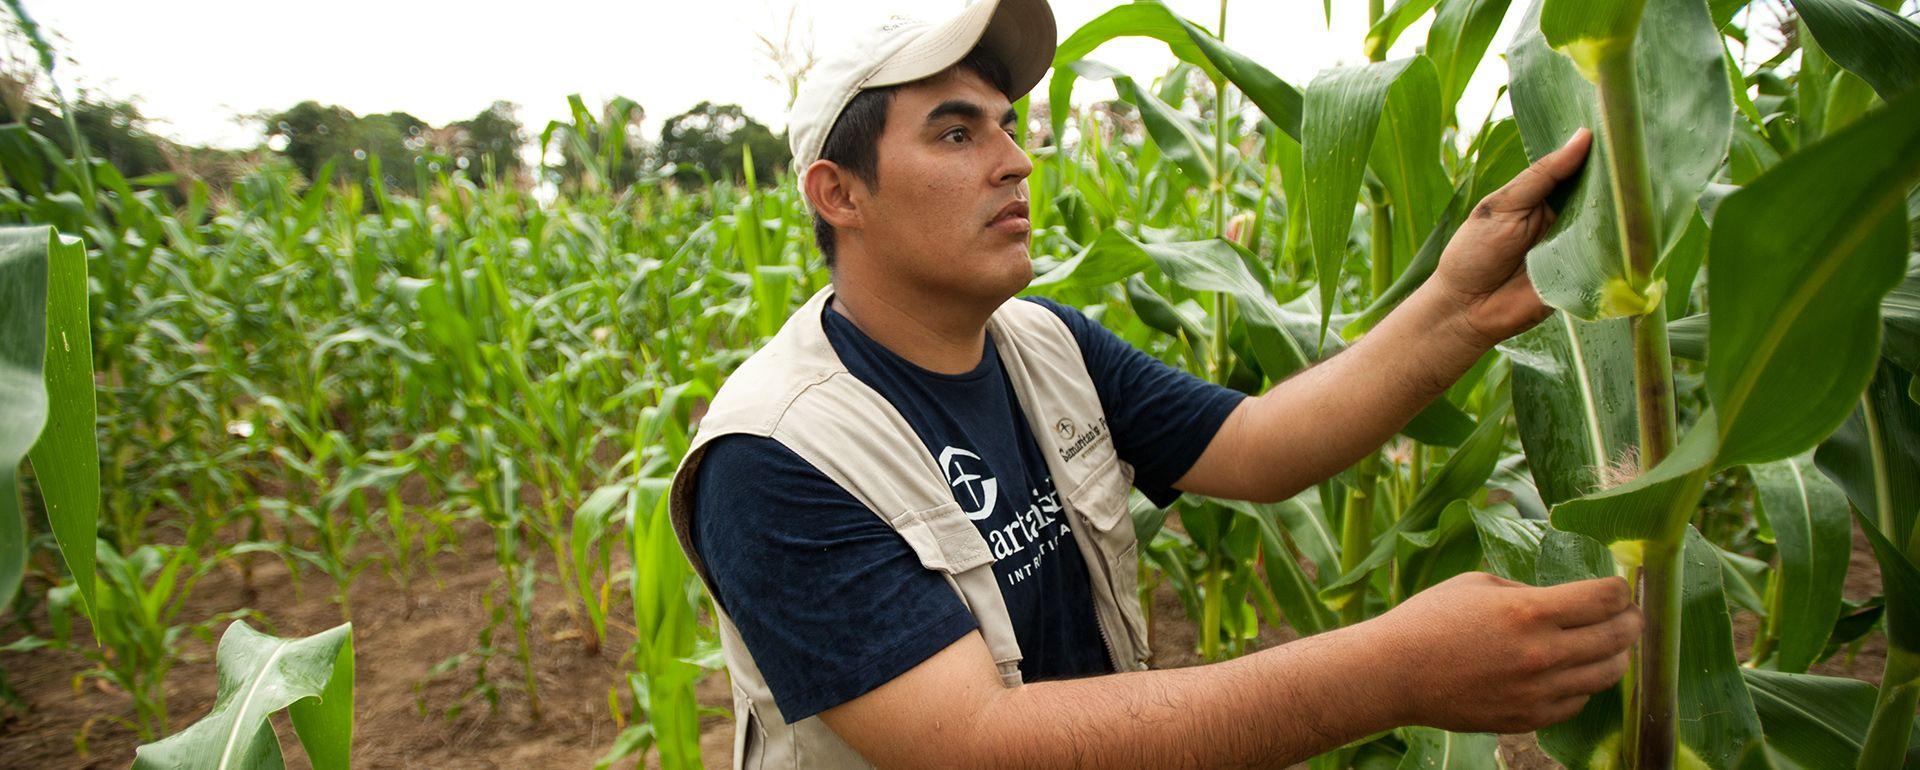 Samaritan's Purse: Animals, Agriculture & Livelihoods